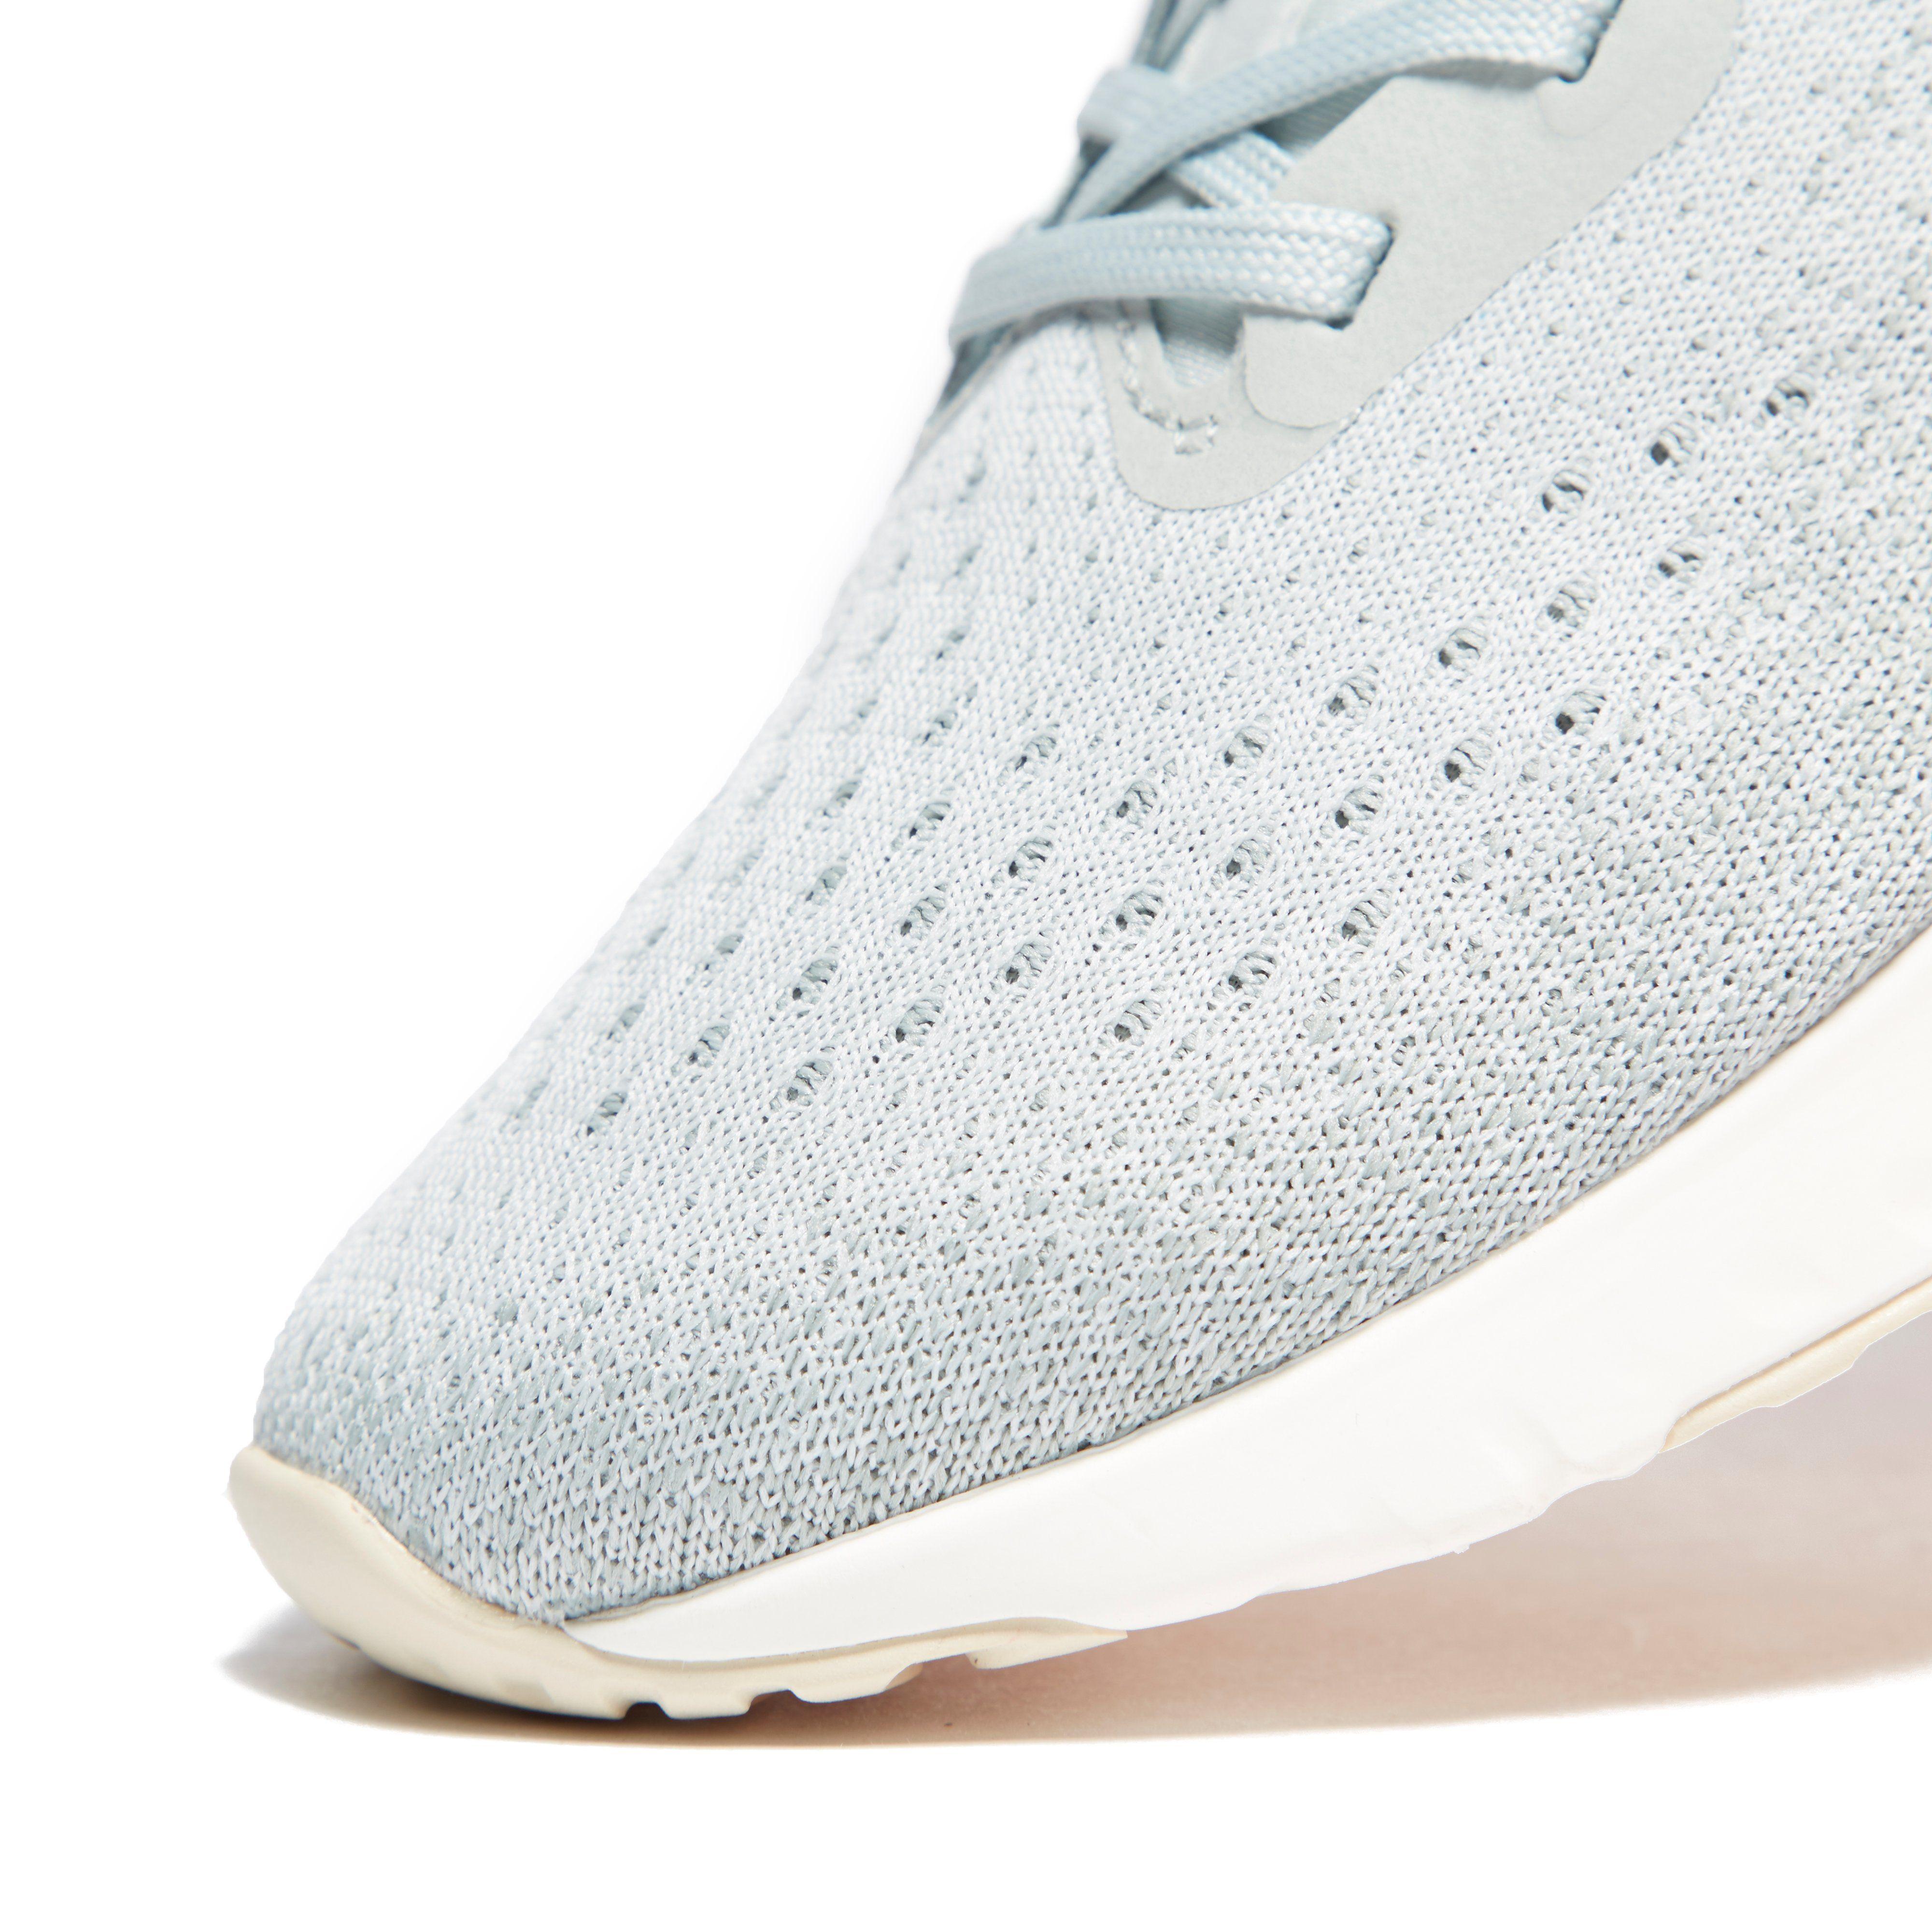 Nike Odyssey React Women's Running Shoes